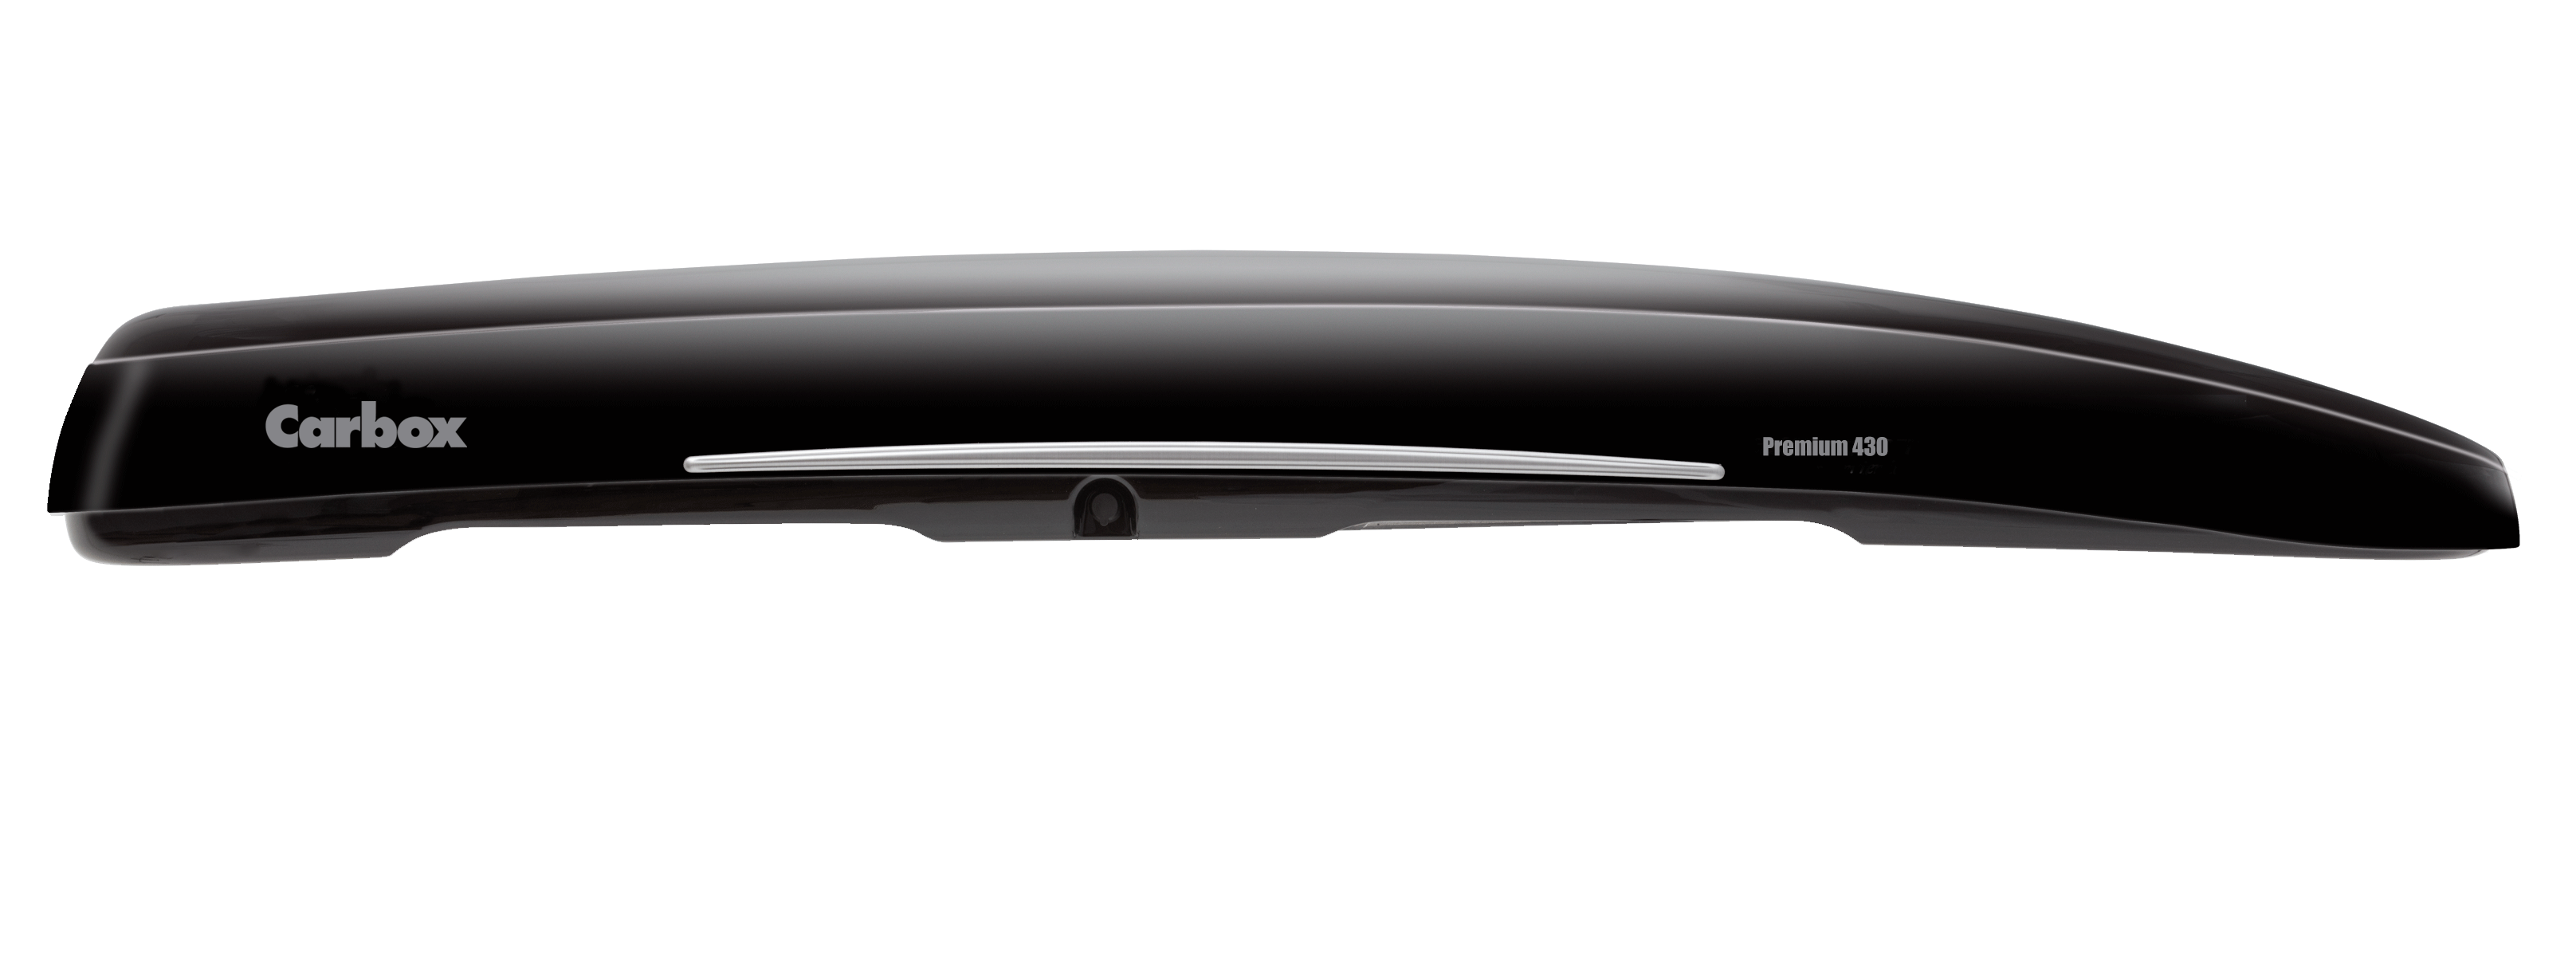 Carbox Dachbox Dachbox Nordic Loader hochglanzschwarz mit Befestigung QG2.0